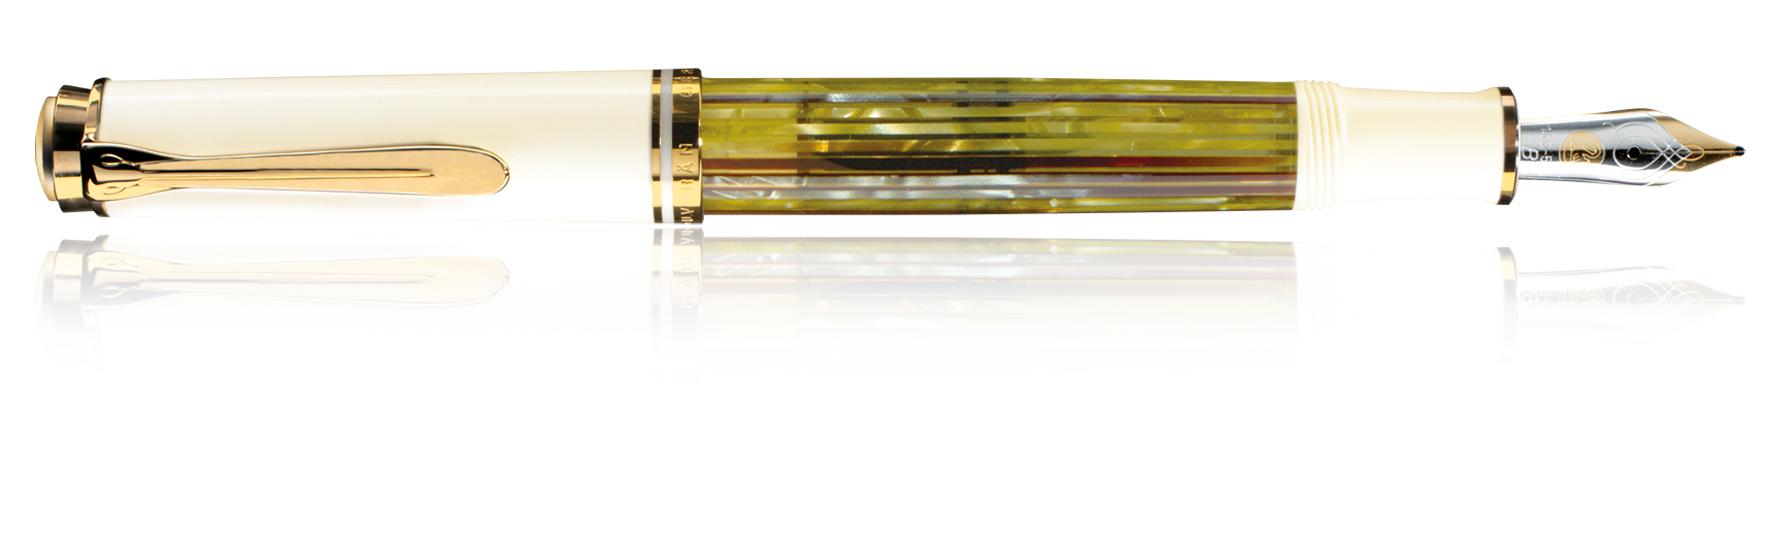 Pelikan Souverän M400 - Gold - Weiß - Blau - Gold - 1 Stück(e)